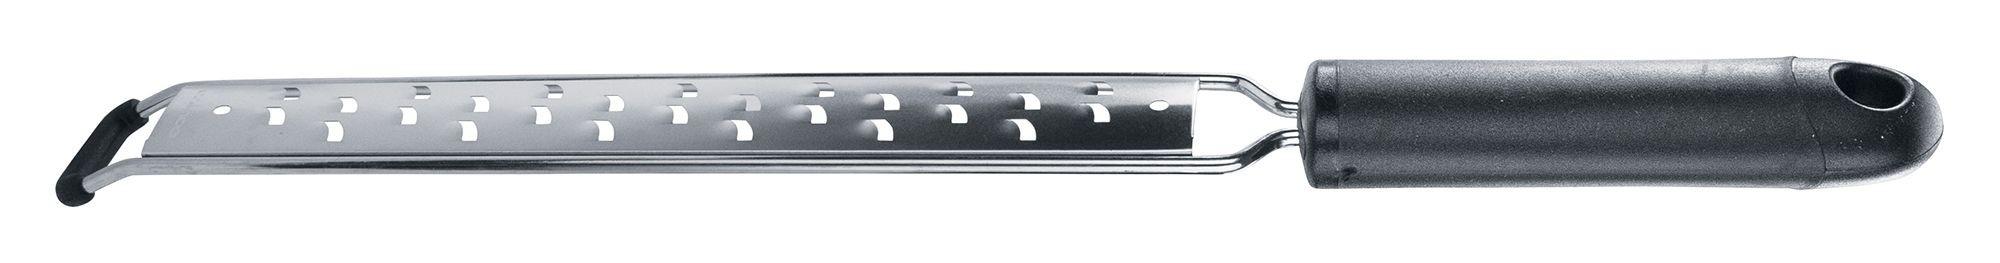 Winco GT-203 Medium Coarse Blade Grater with Anti-Slip Feet